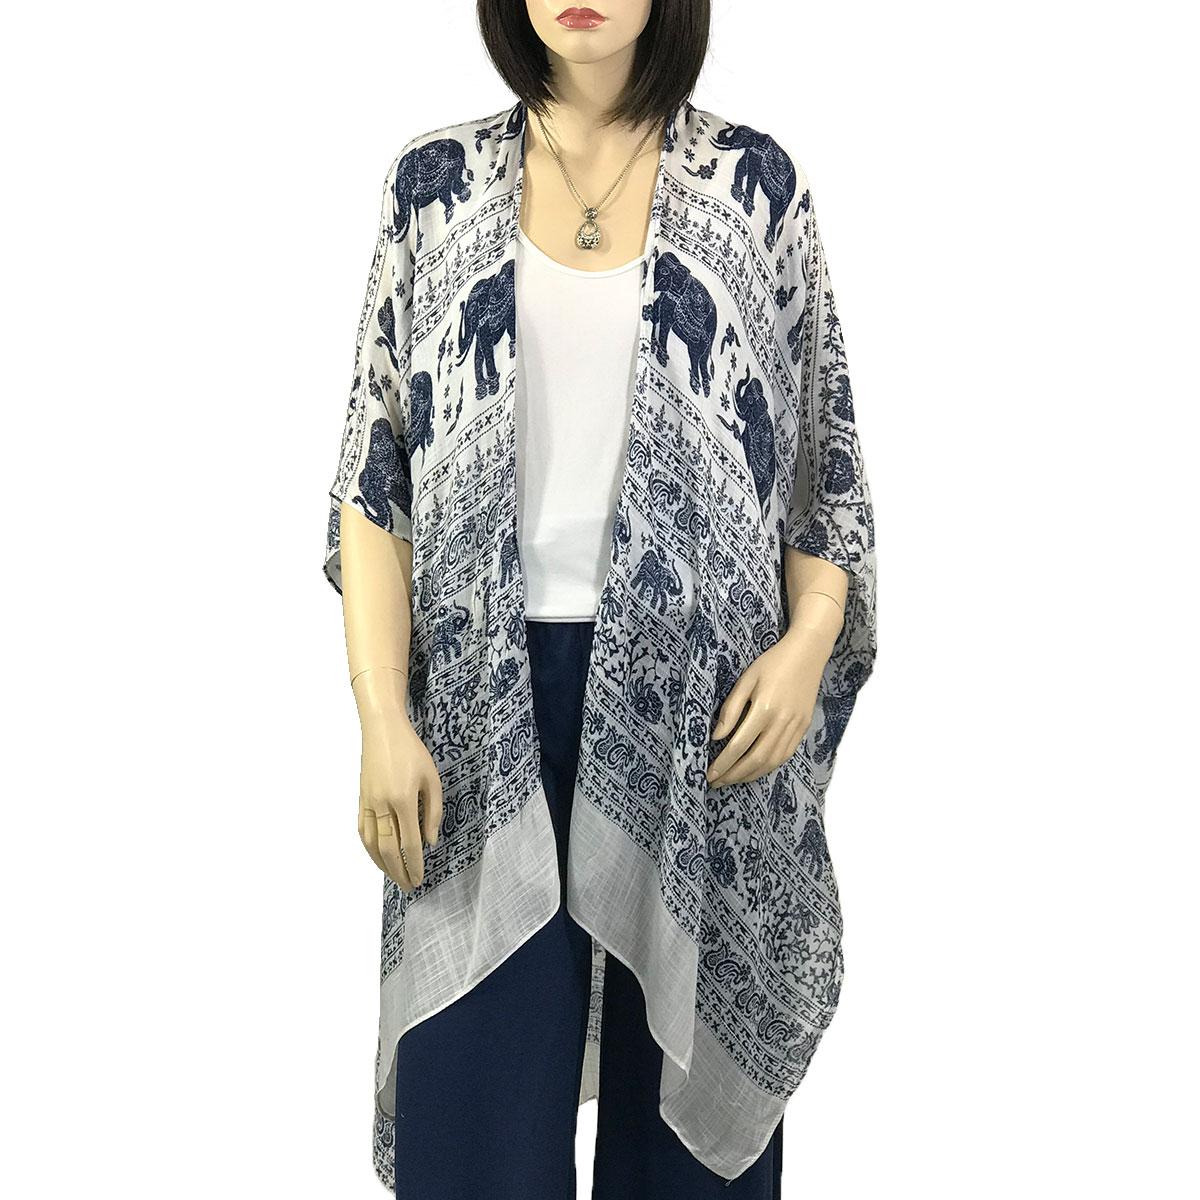 Kimono - Elephant Print 290 - Blue